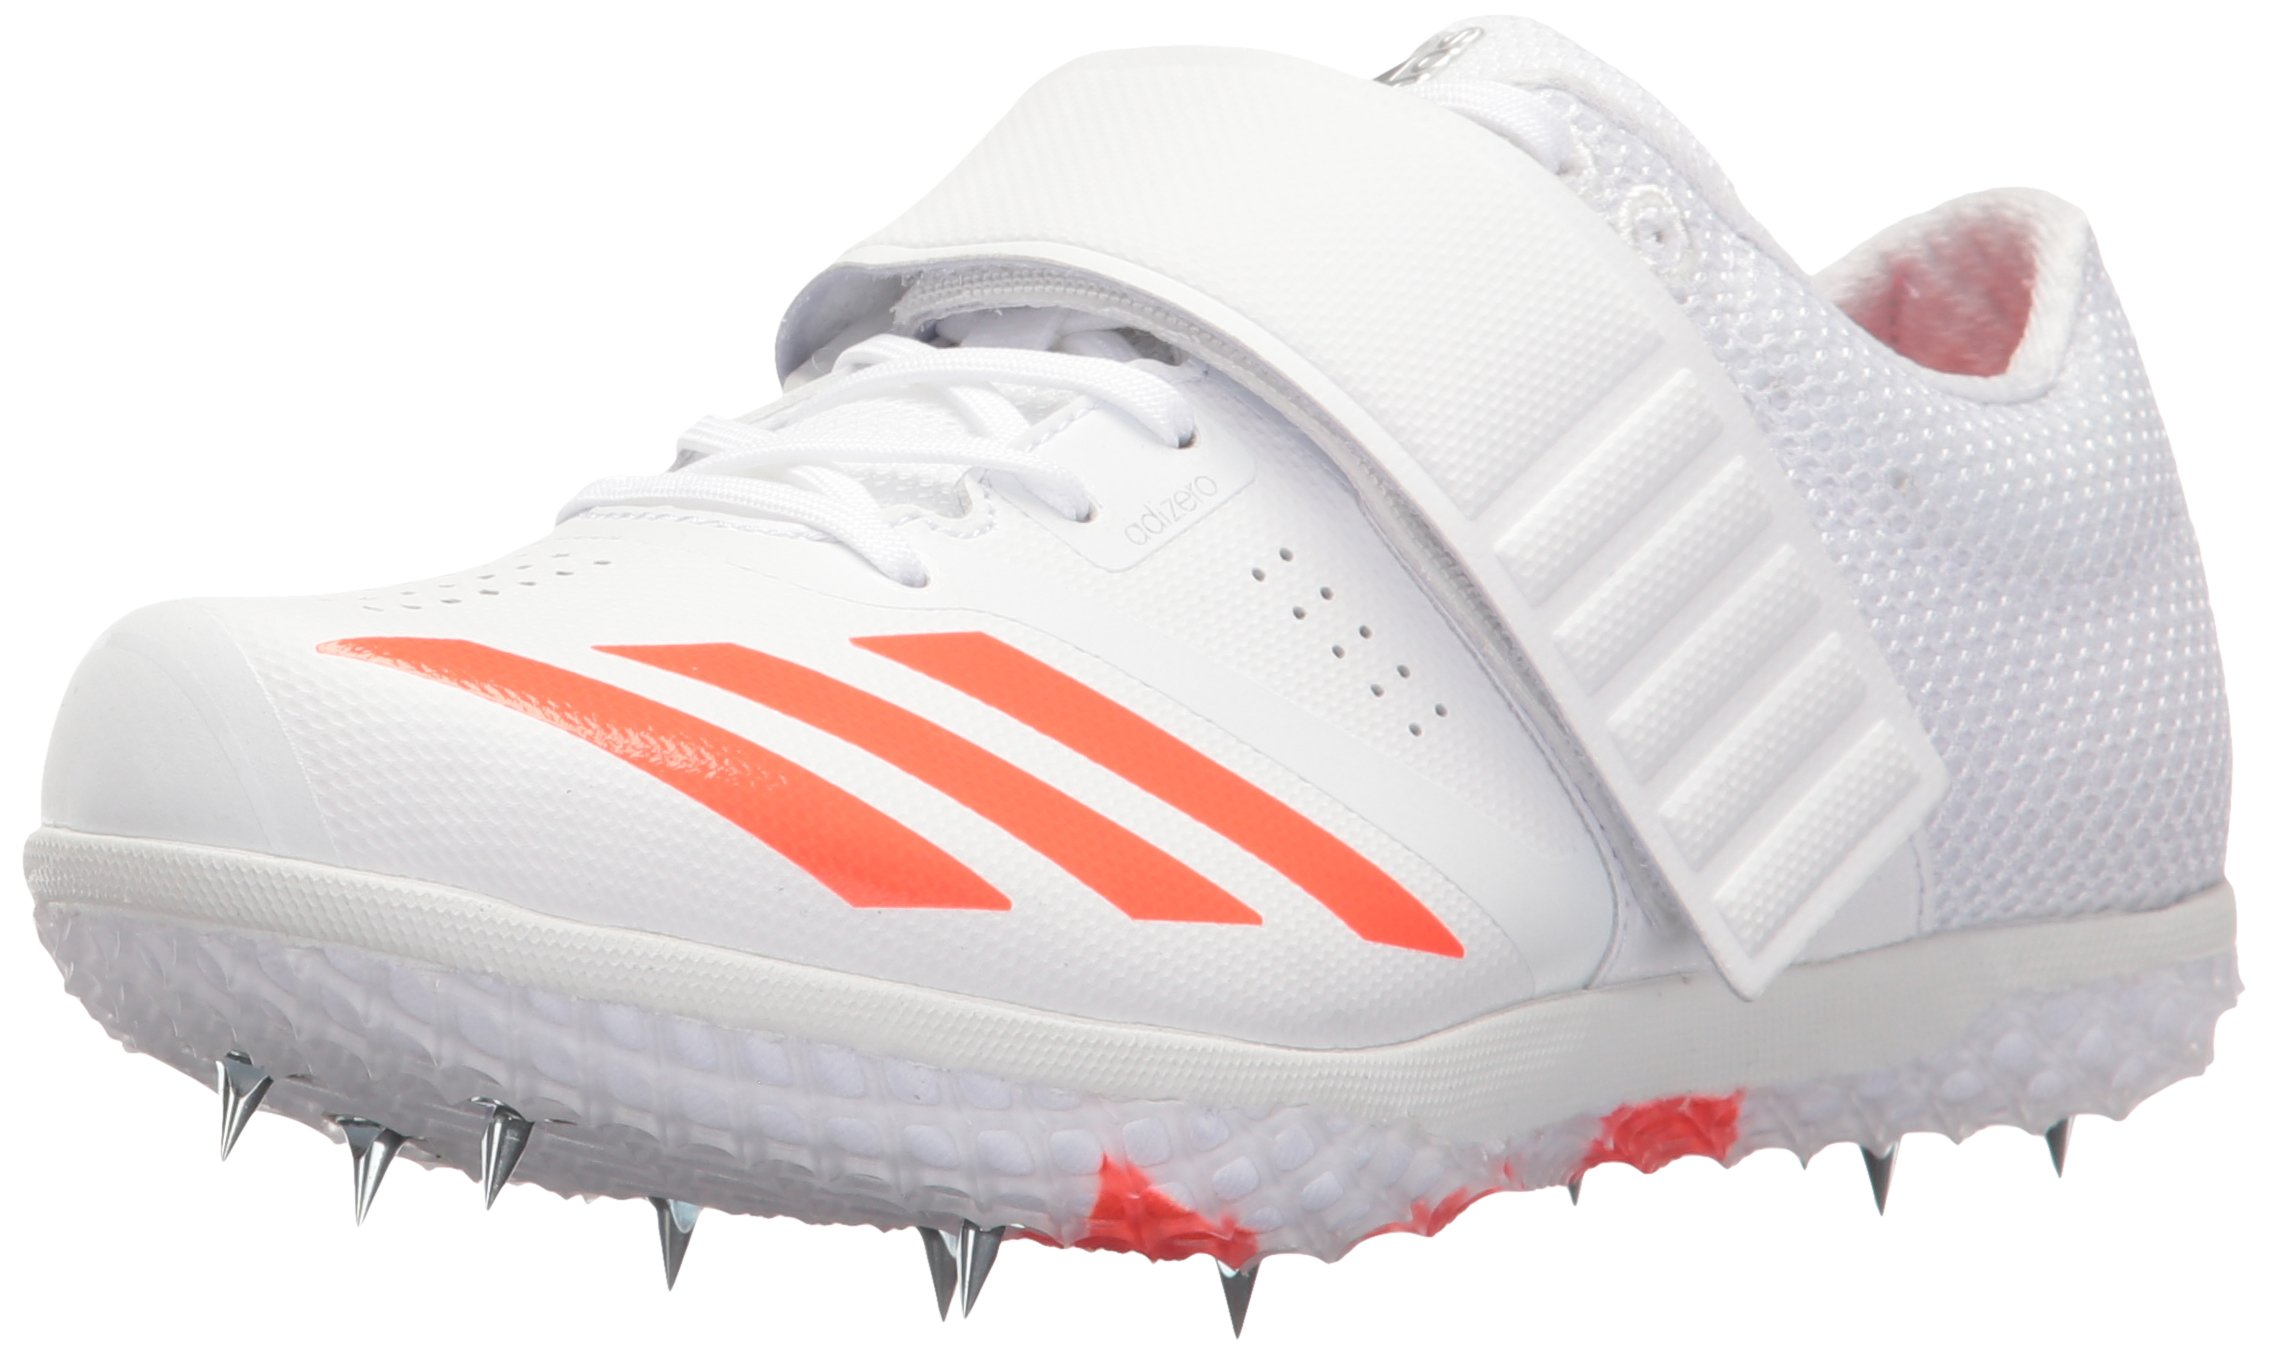 adidas Adizero HJ Track Shoe, White/Infrared/Metallic/Silver, 7.5 M US